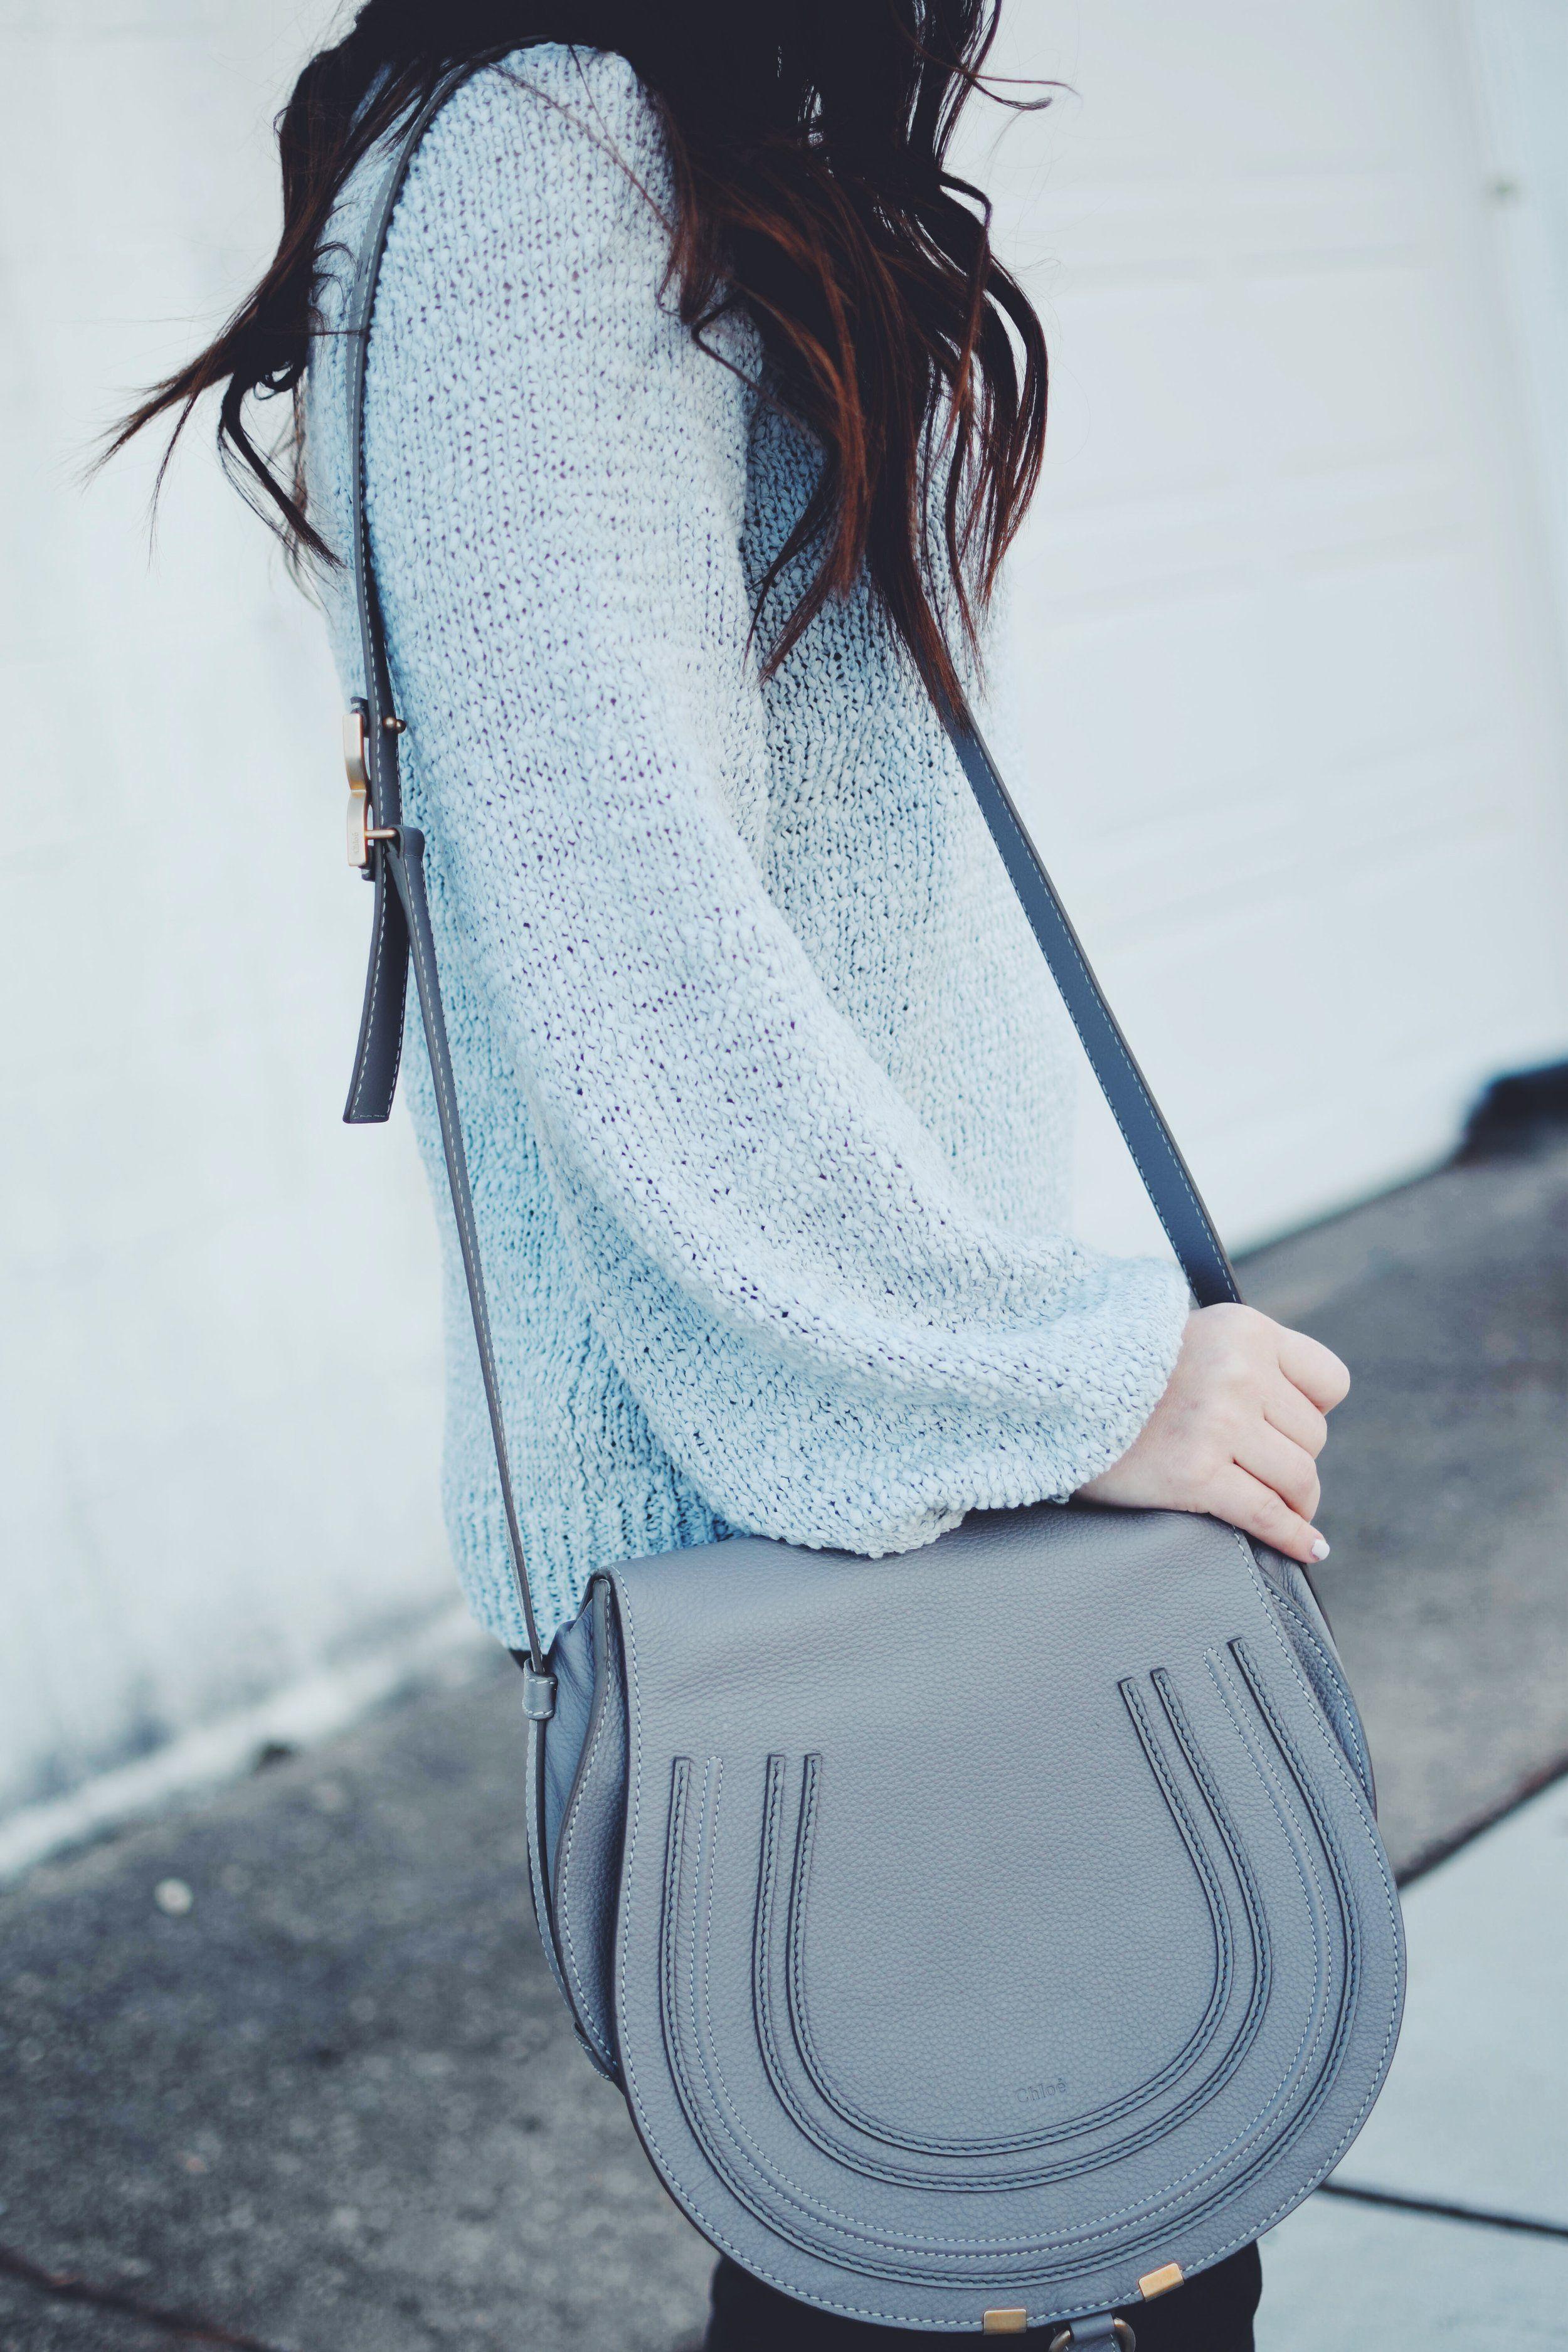 Chloé Marcie Medium Leather Crossbody Bag Review Pine Barren Beauty Designer Handbag Best Splurge Worthy